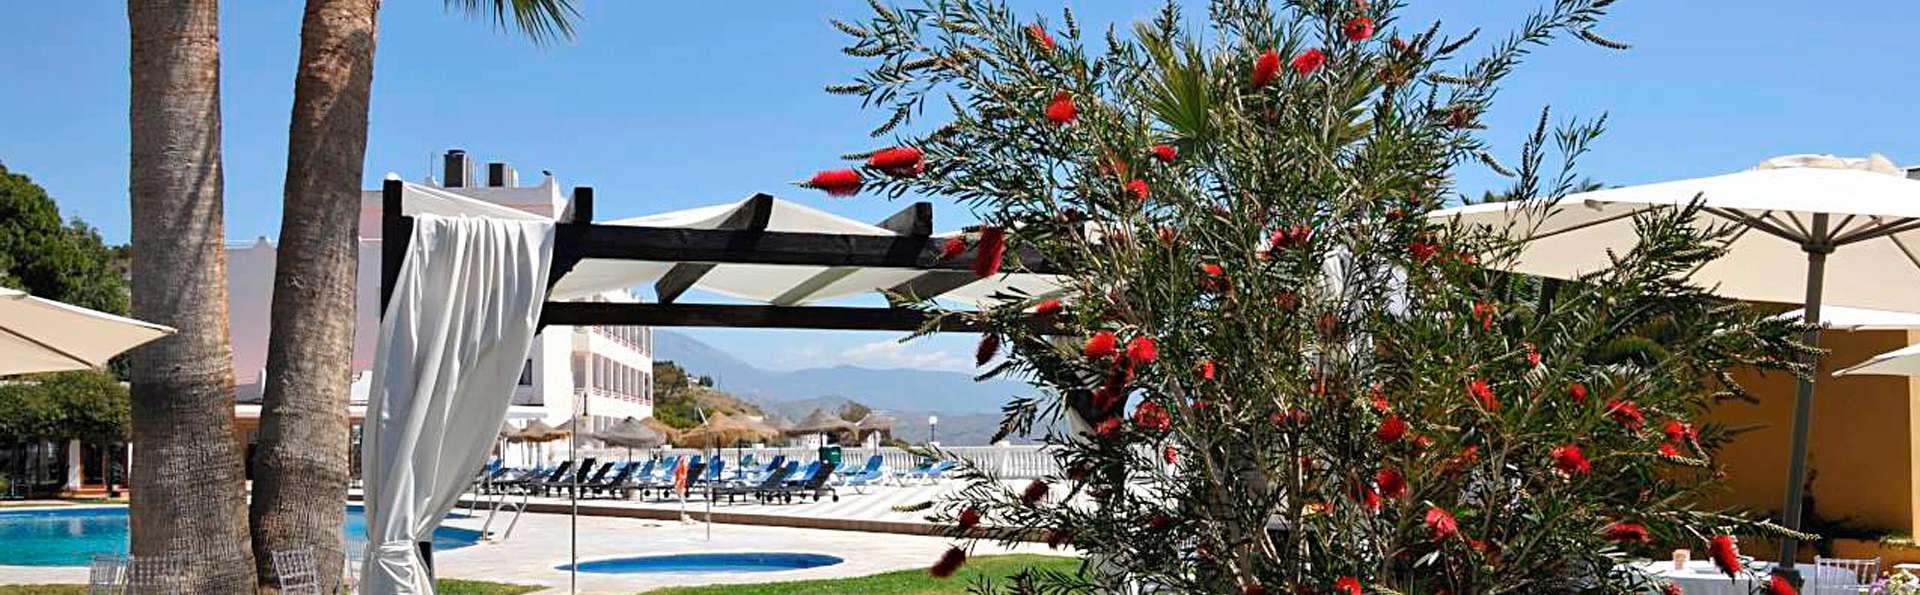 Hotel Salobreña suites - edit_garden_pool.jpg